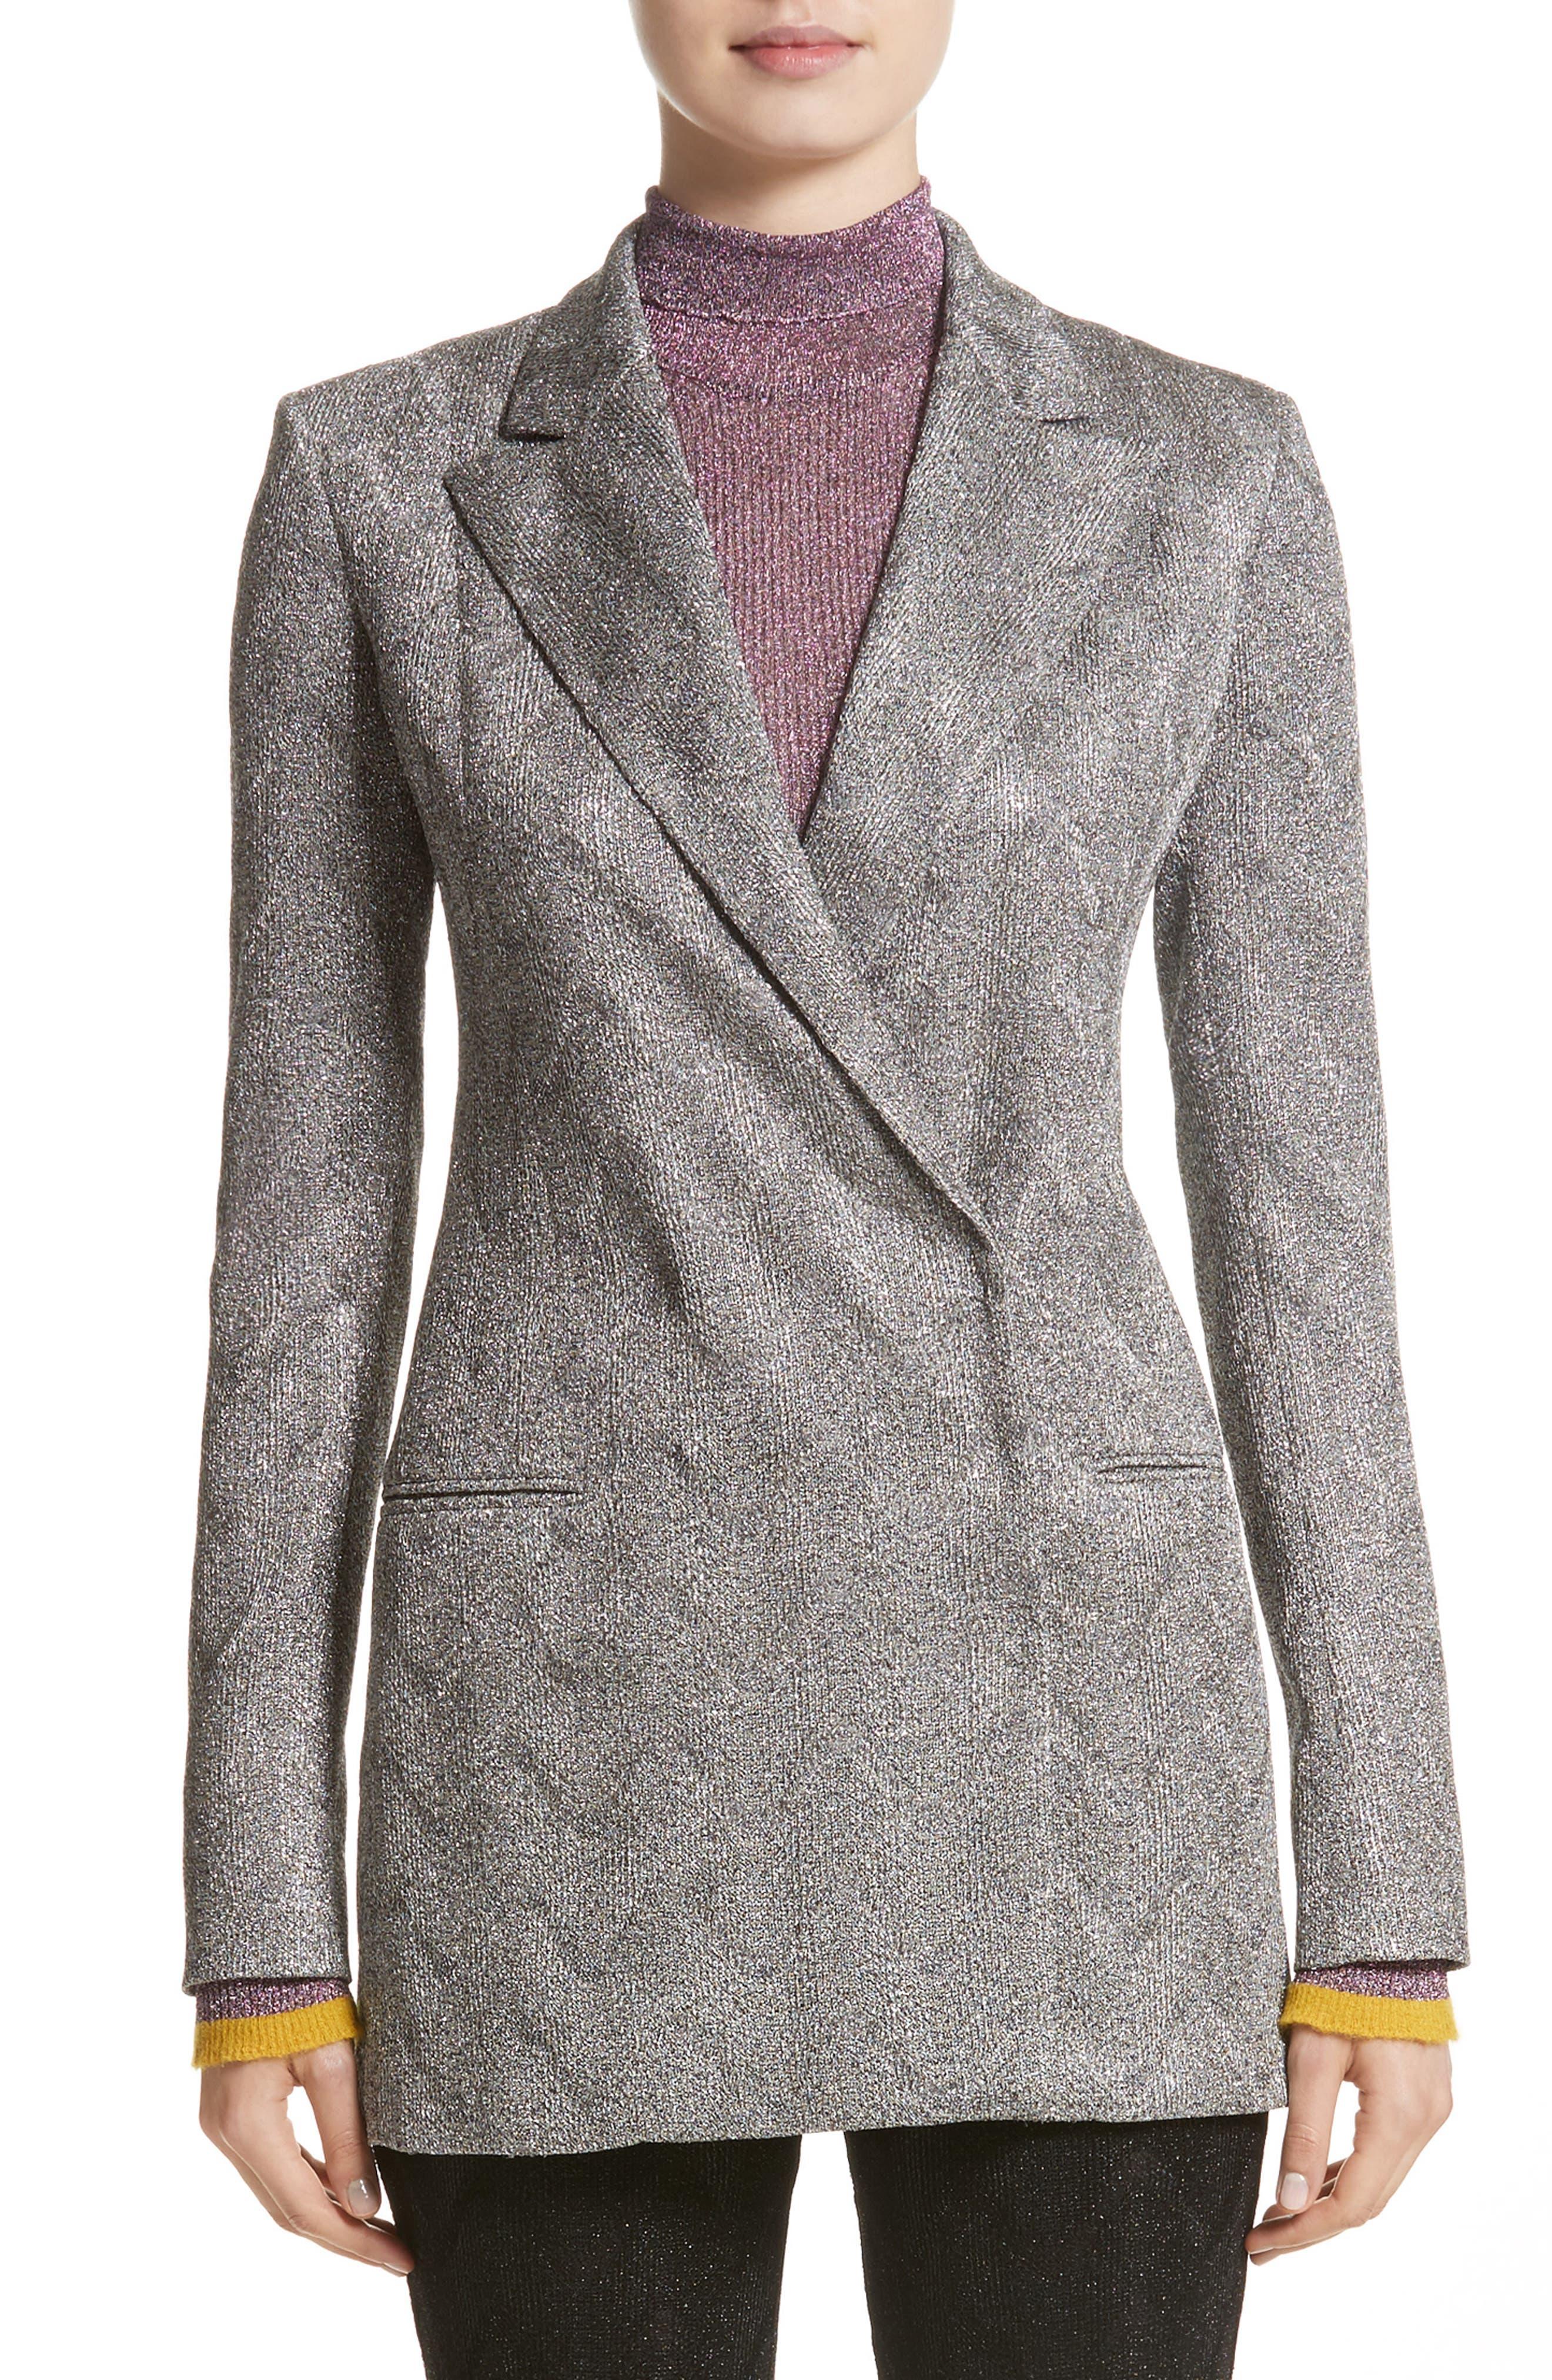 Alternate Image 1 Selected - Missoni Metallic Knit Double Breasted Jacket